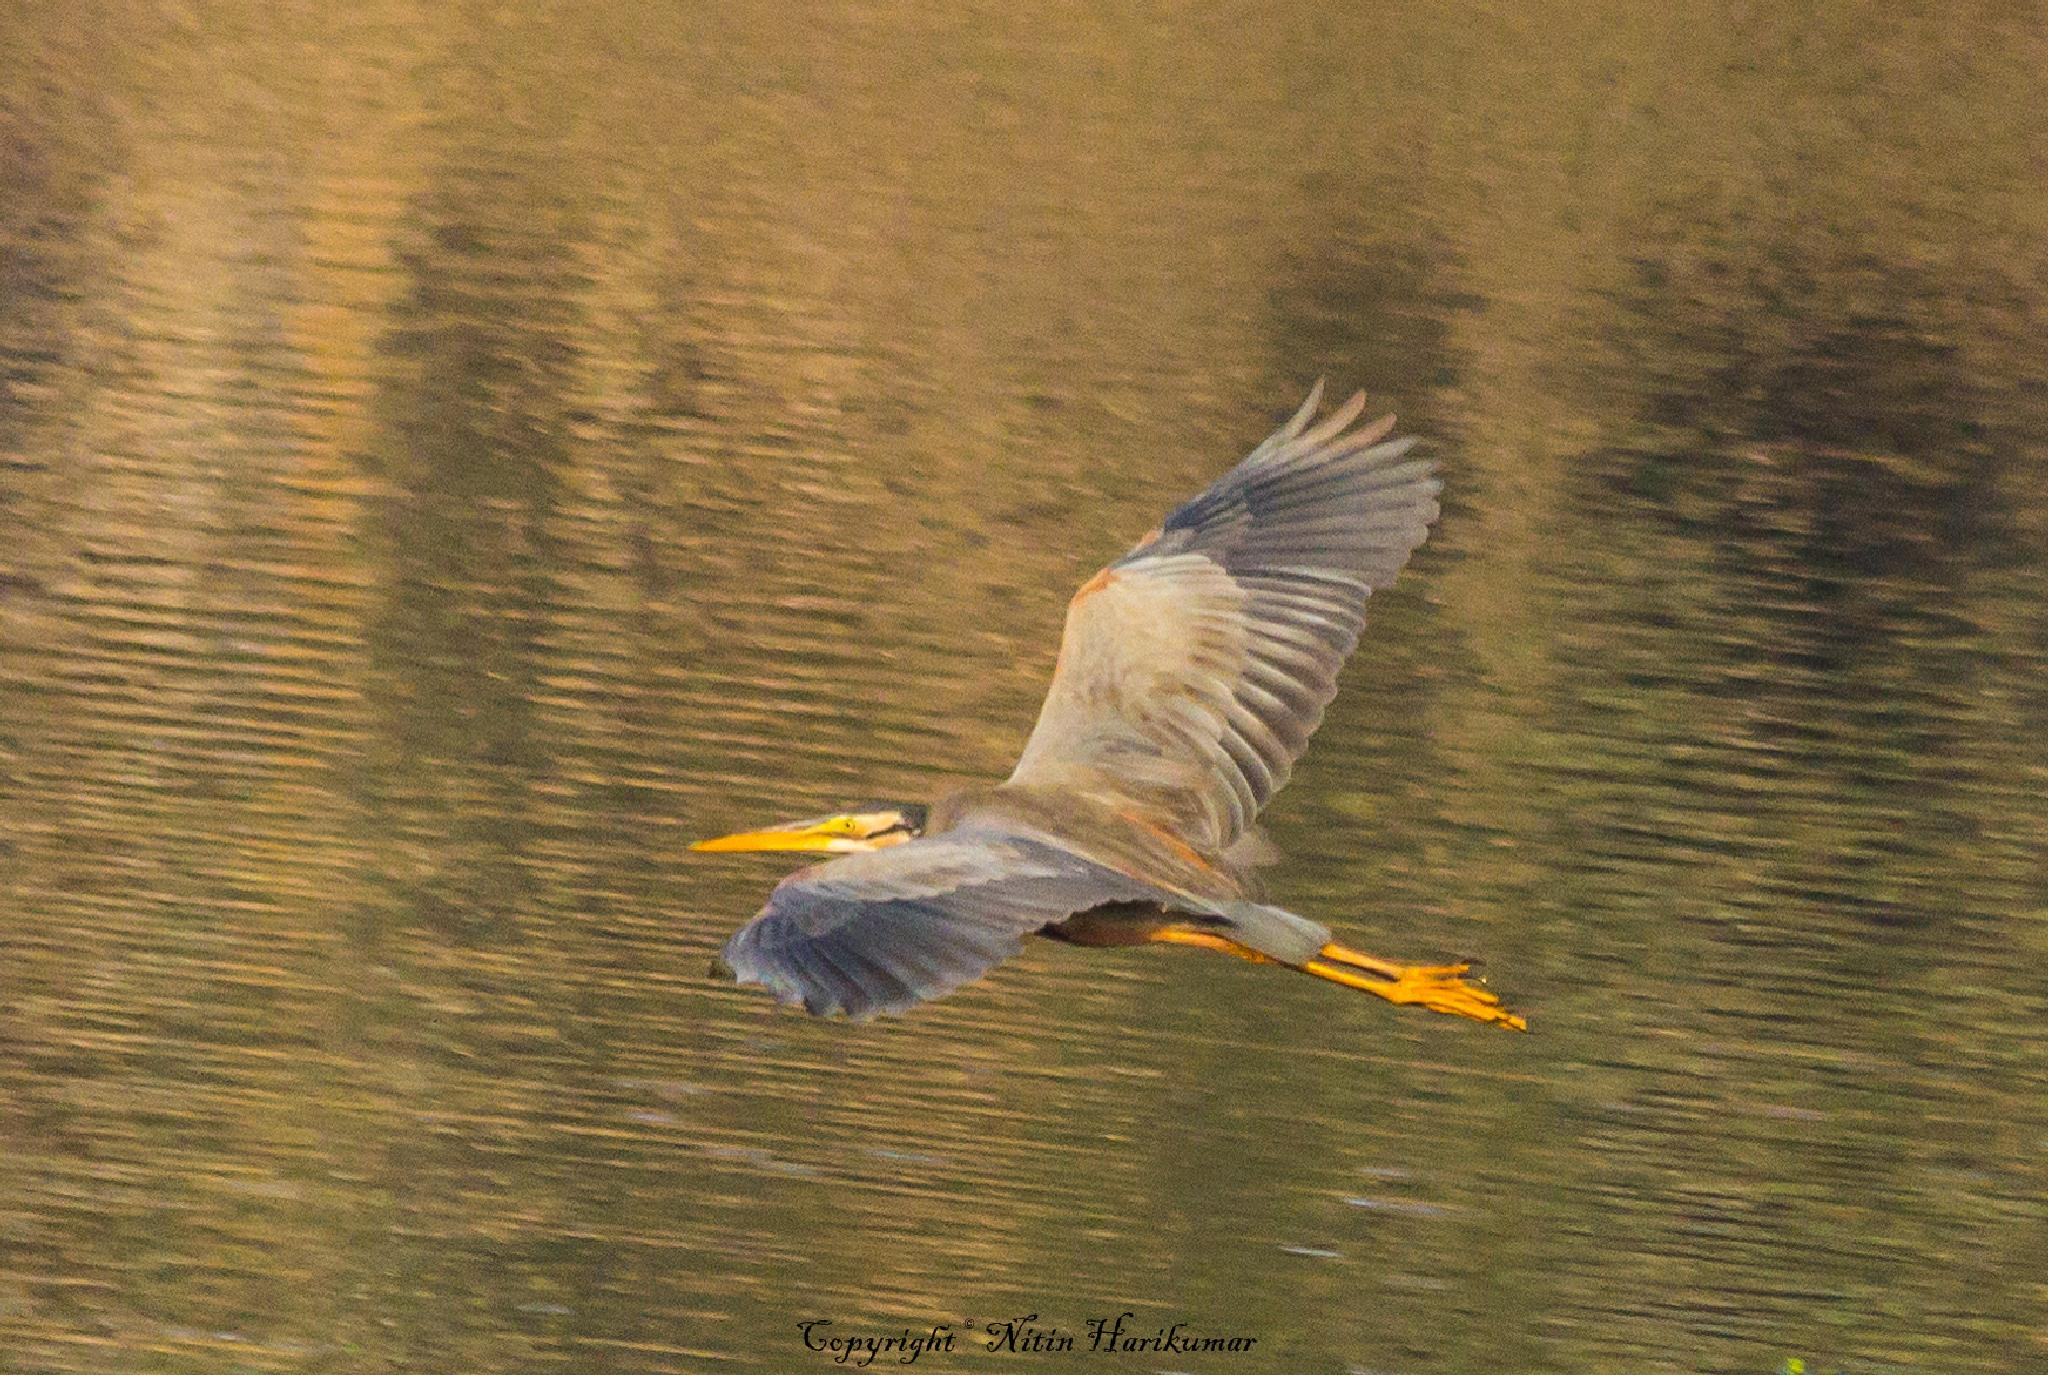 In Flight by Nitin Harikumar